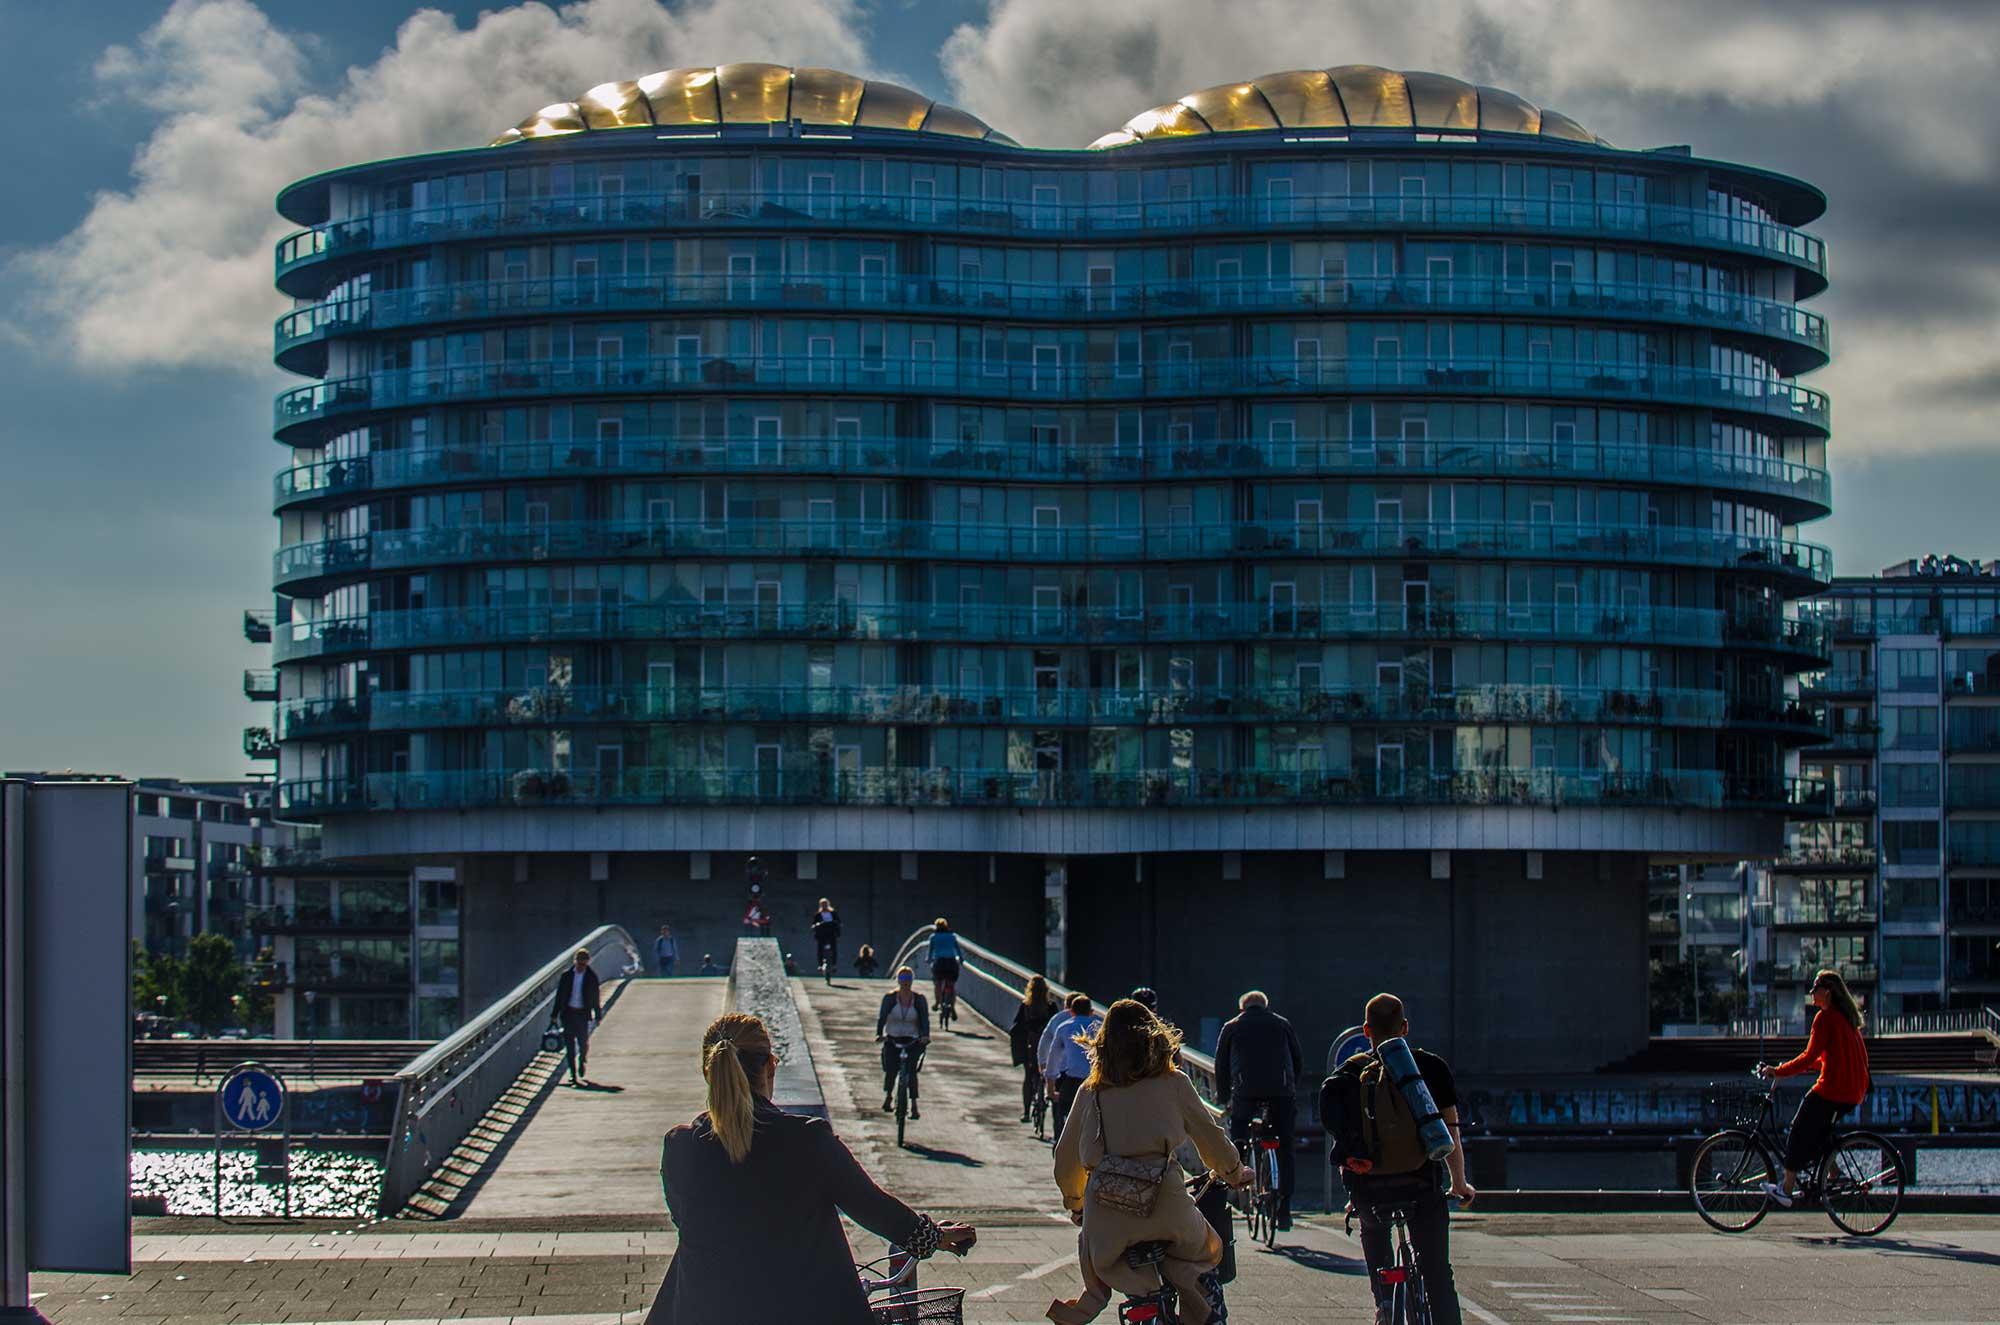 Grain Silos Copenhagen Silos Copenhagen Siloen Copenhagen krestenhillerup.dk